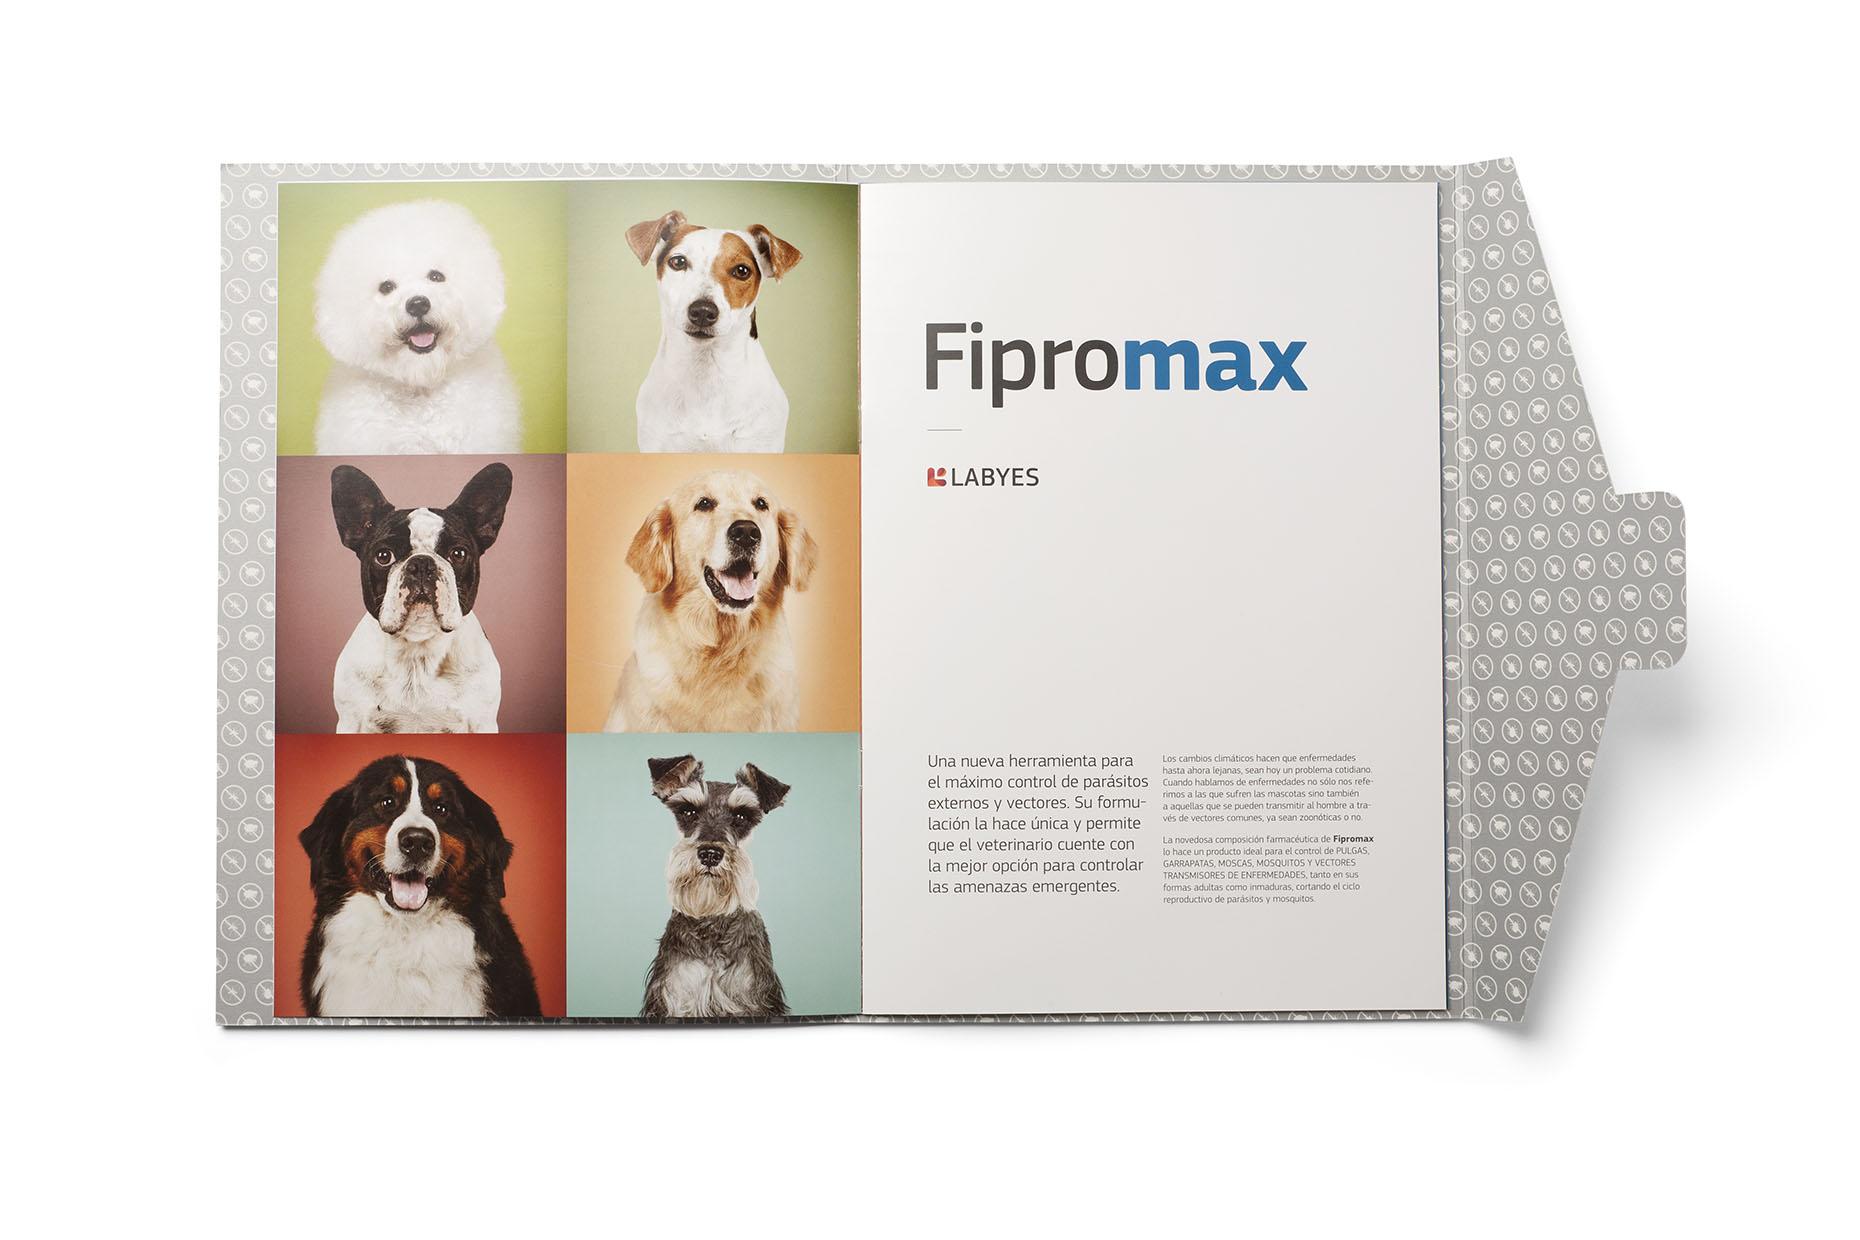 Fipromax_04